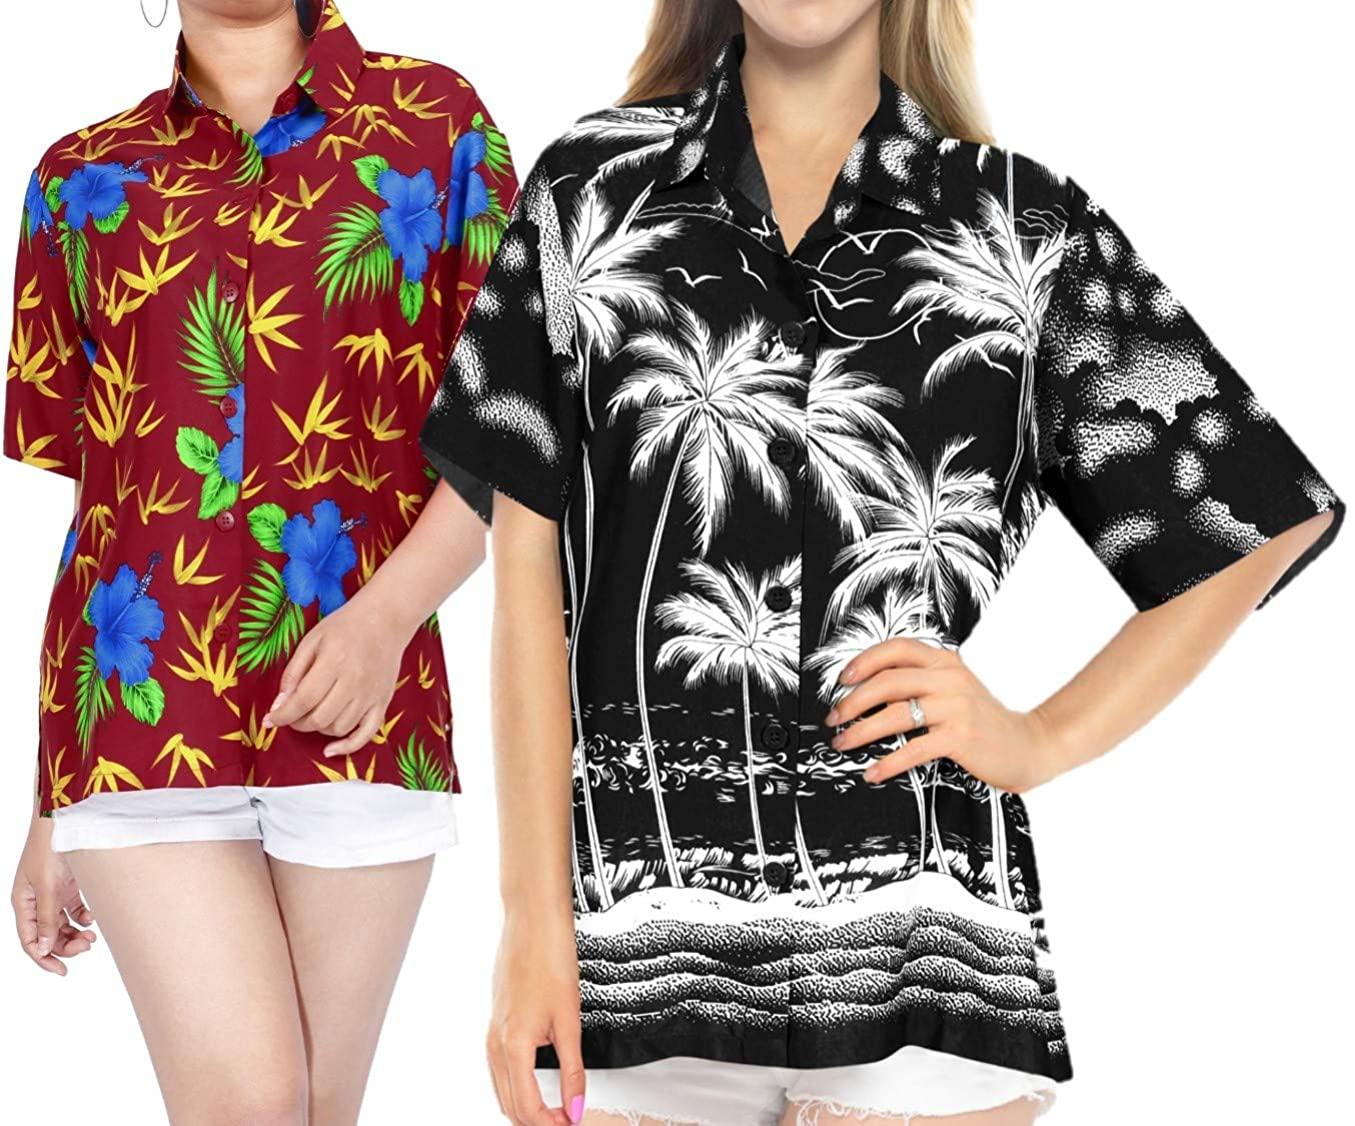 LA LEELA Women's Swim Hawaiian Regular Fit Short Sleeve Tunic Shirt Work from Home Clothes Women Beach Shirt Blouse Shirt Combo Pack of 2 Size M